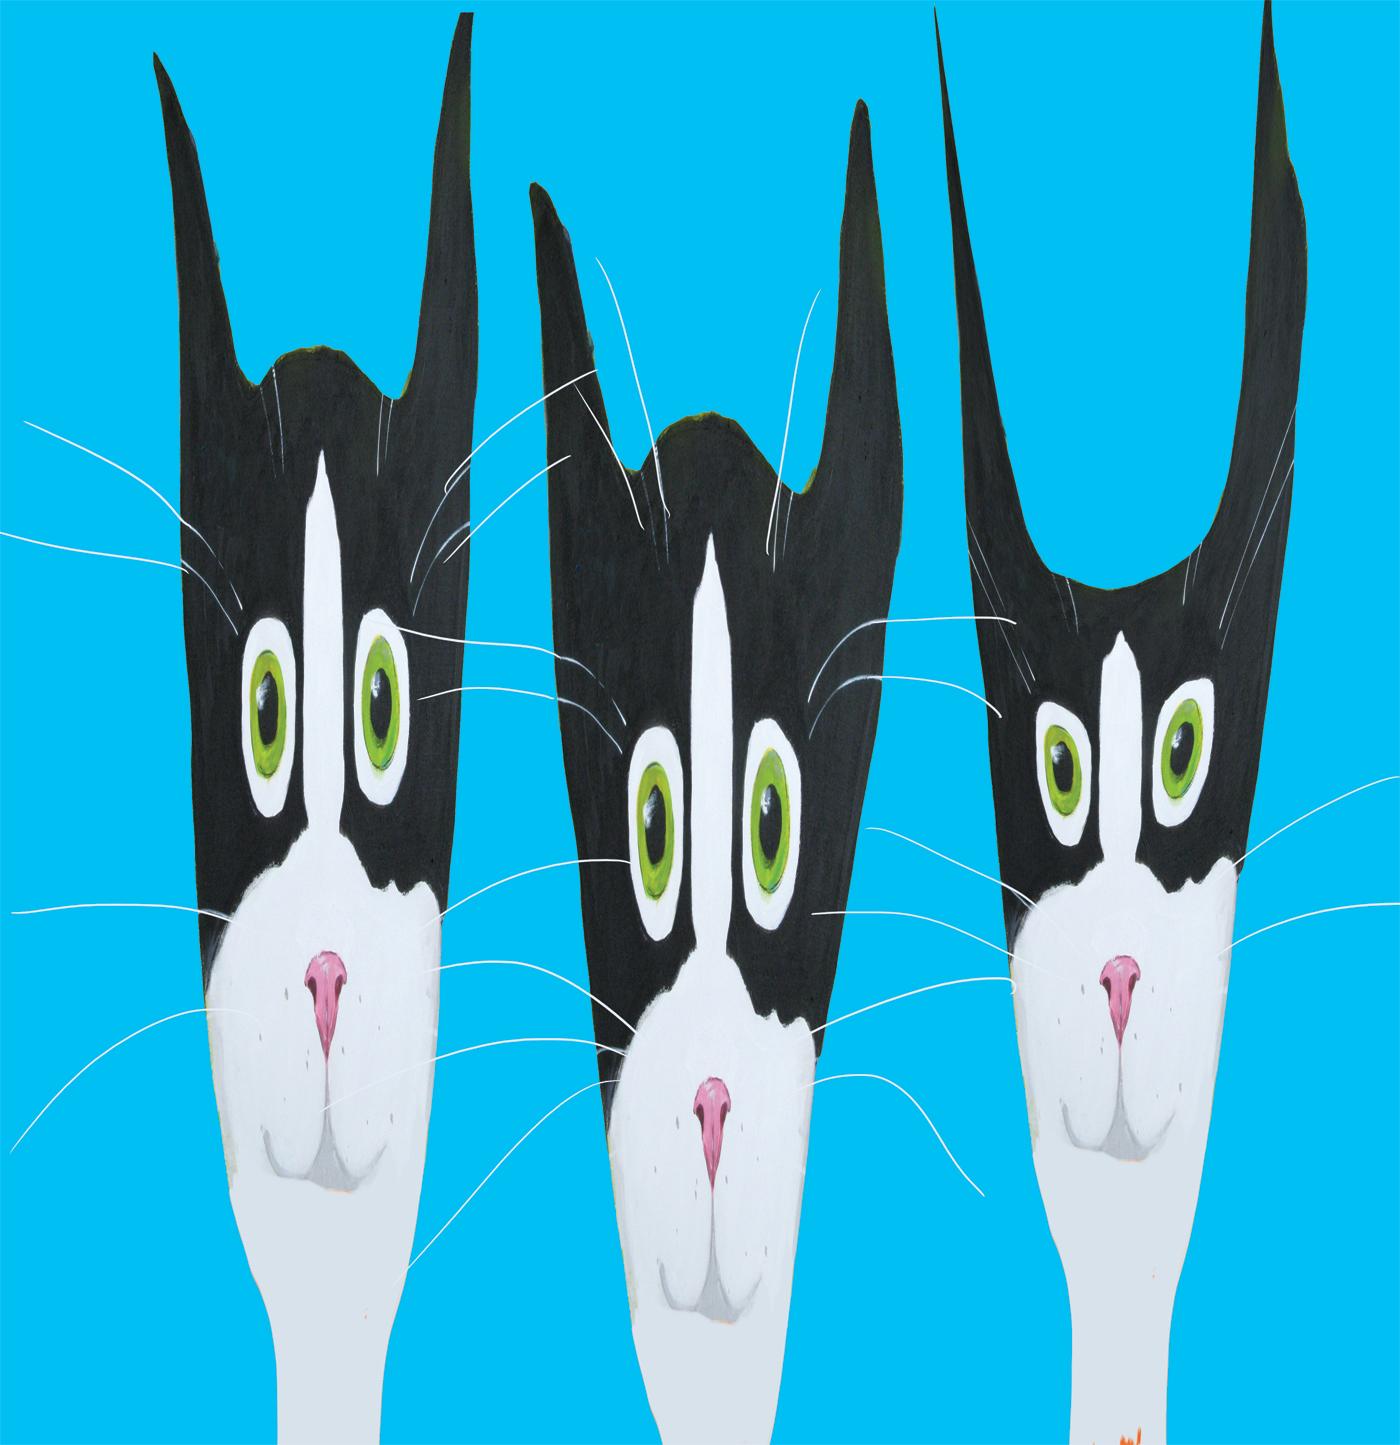 Alison-E_Kurek_Many_Faces_of_Silent_Mylo_Tuxedo_Cat